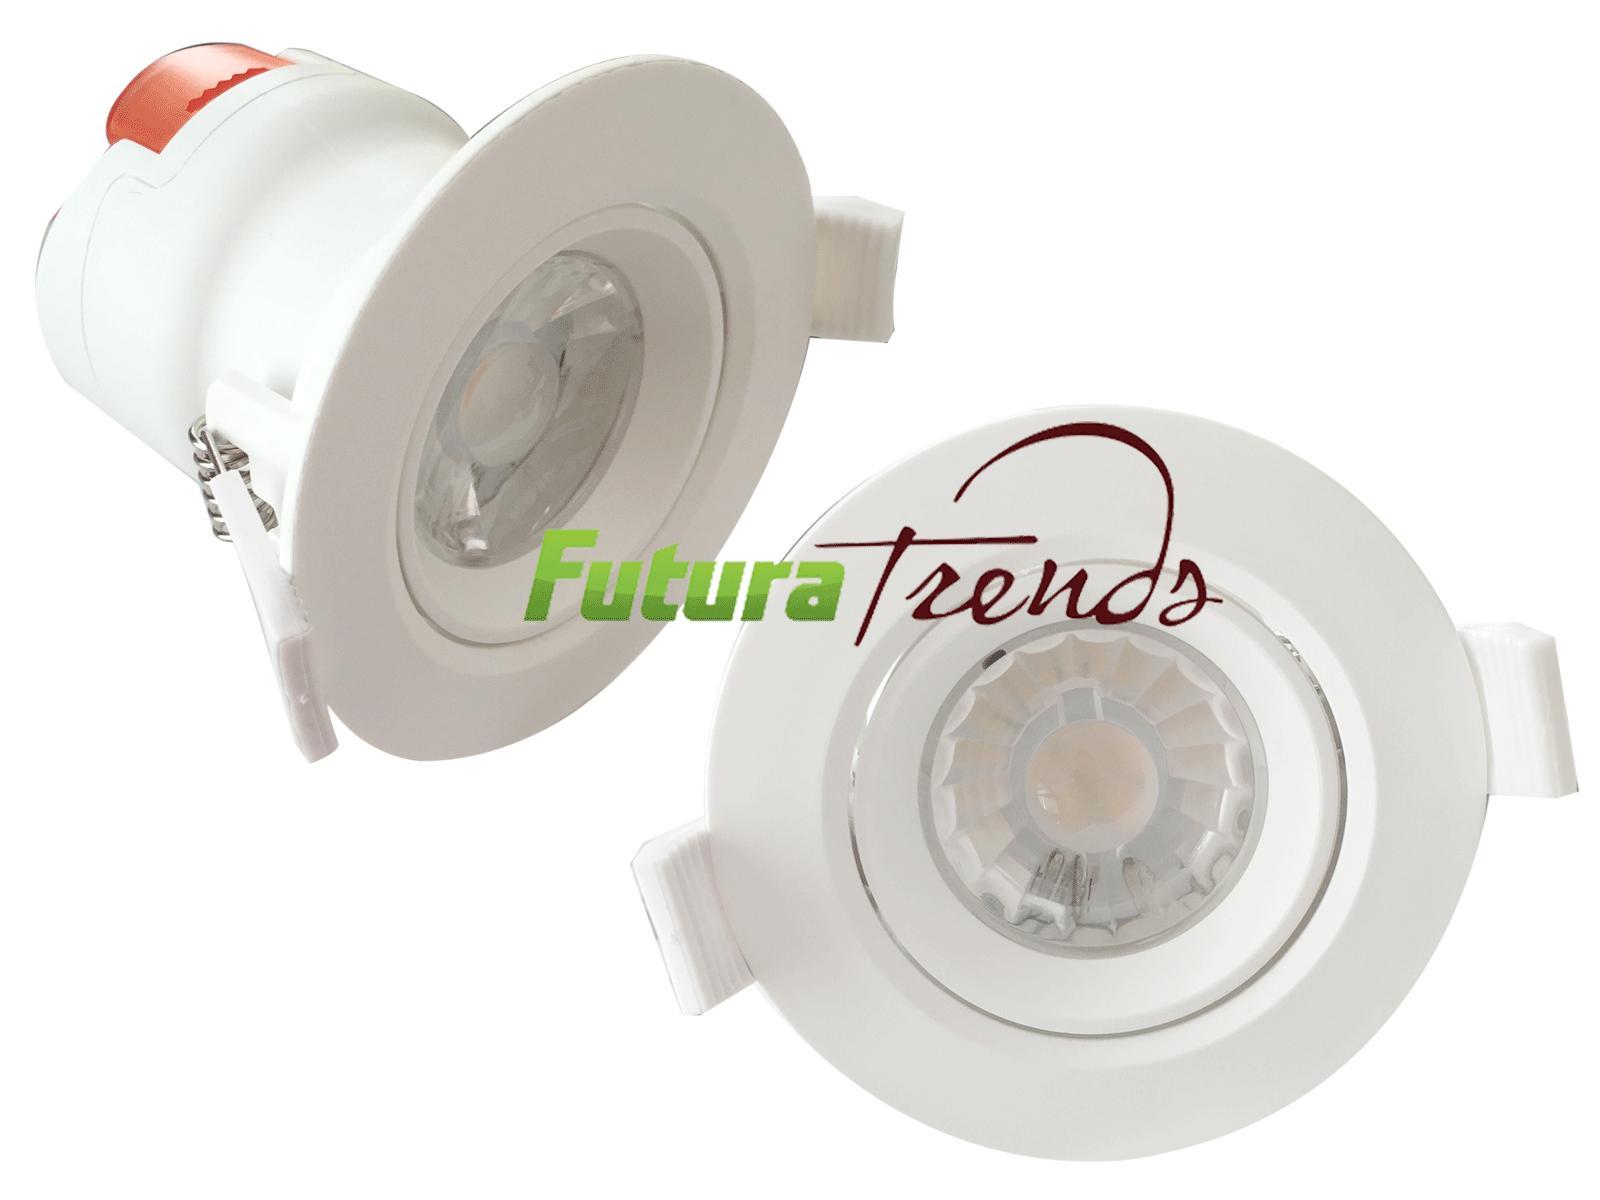 led einbauleuchte down spot einbau strahler lampe 7w 230v. Black Bedroom Furniture Sets. Home Design Ideas